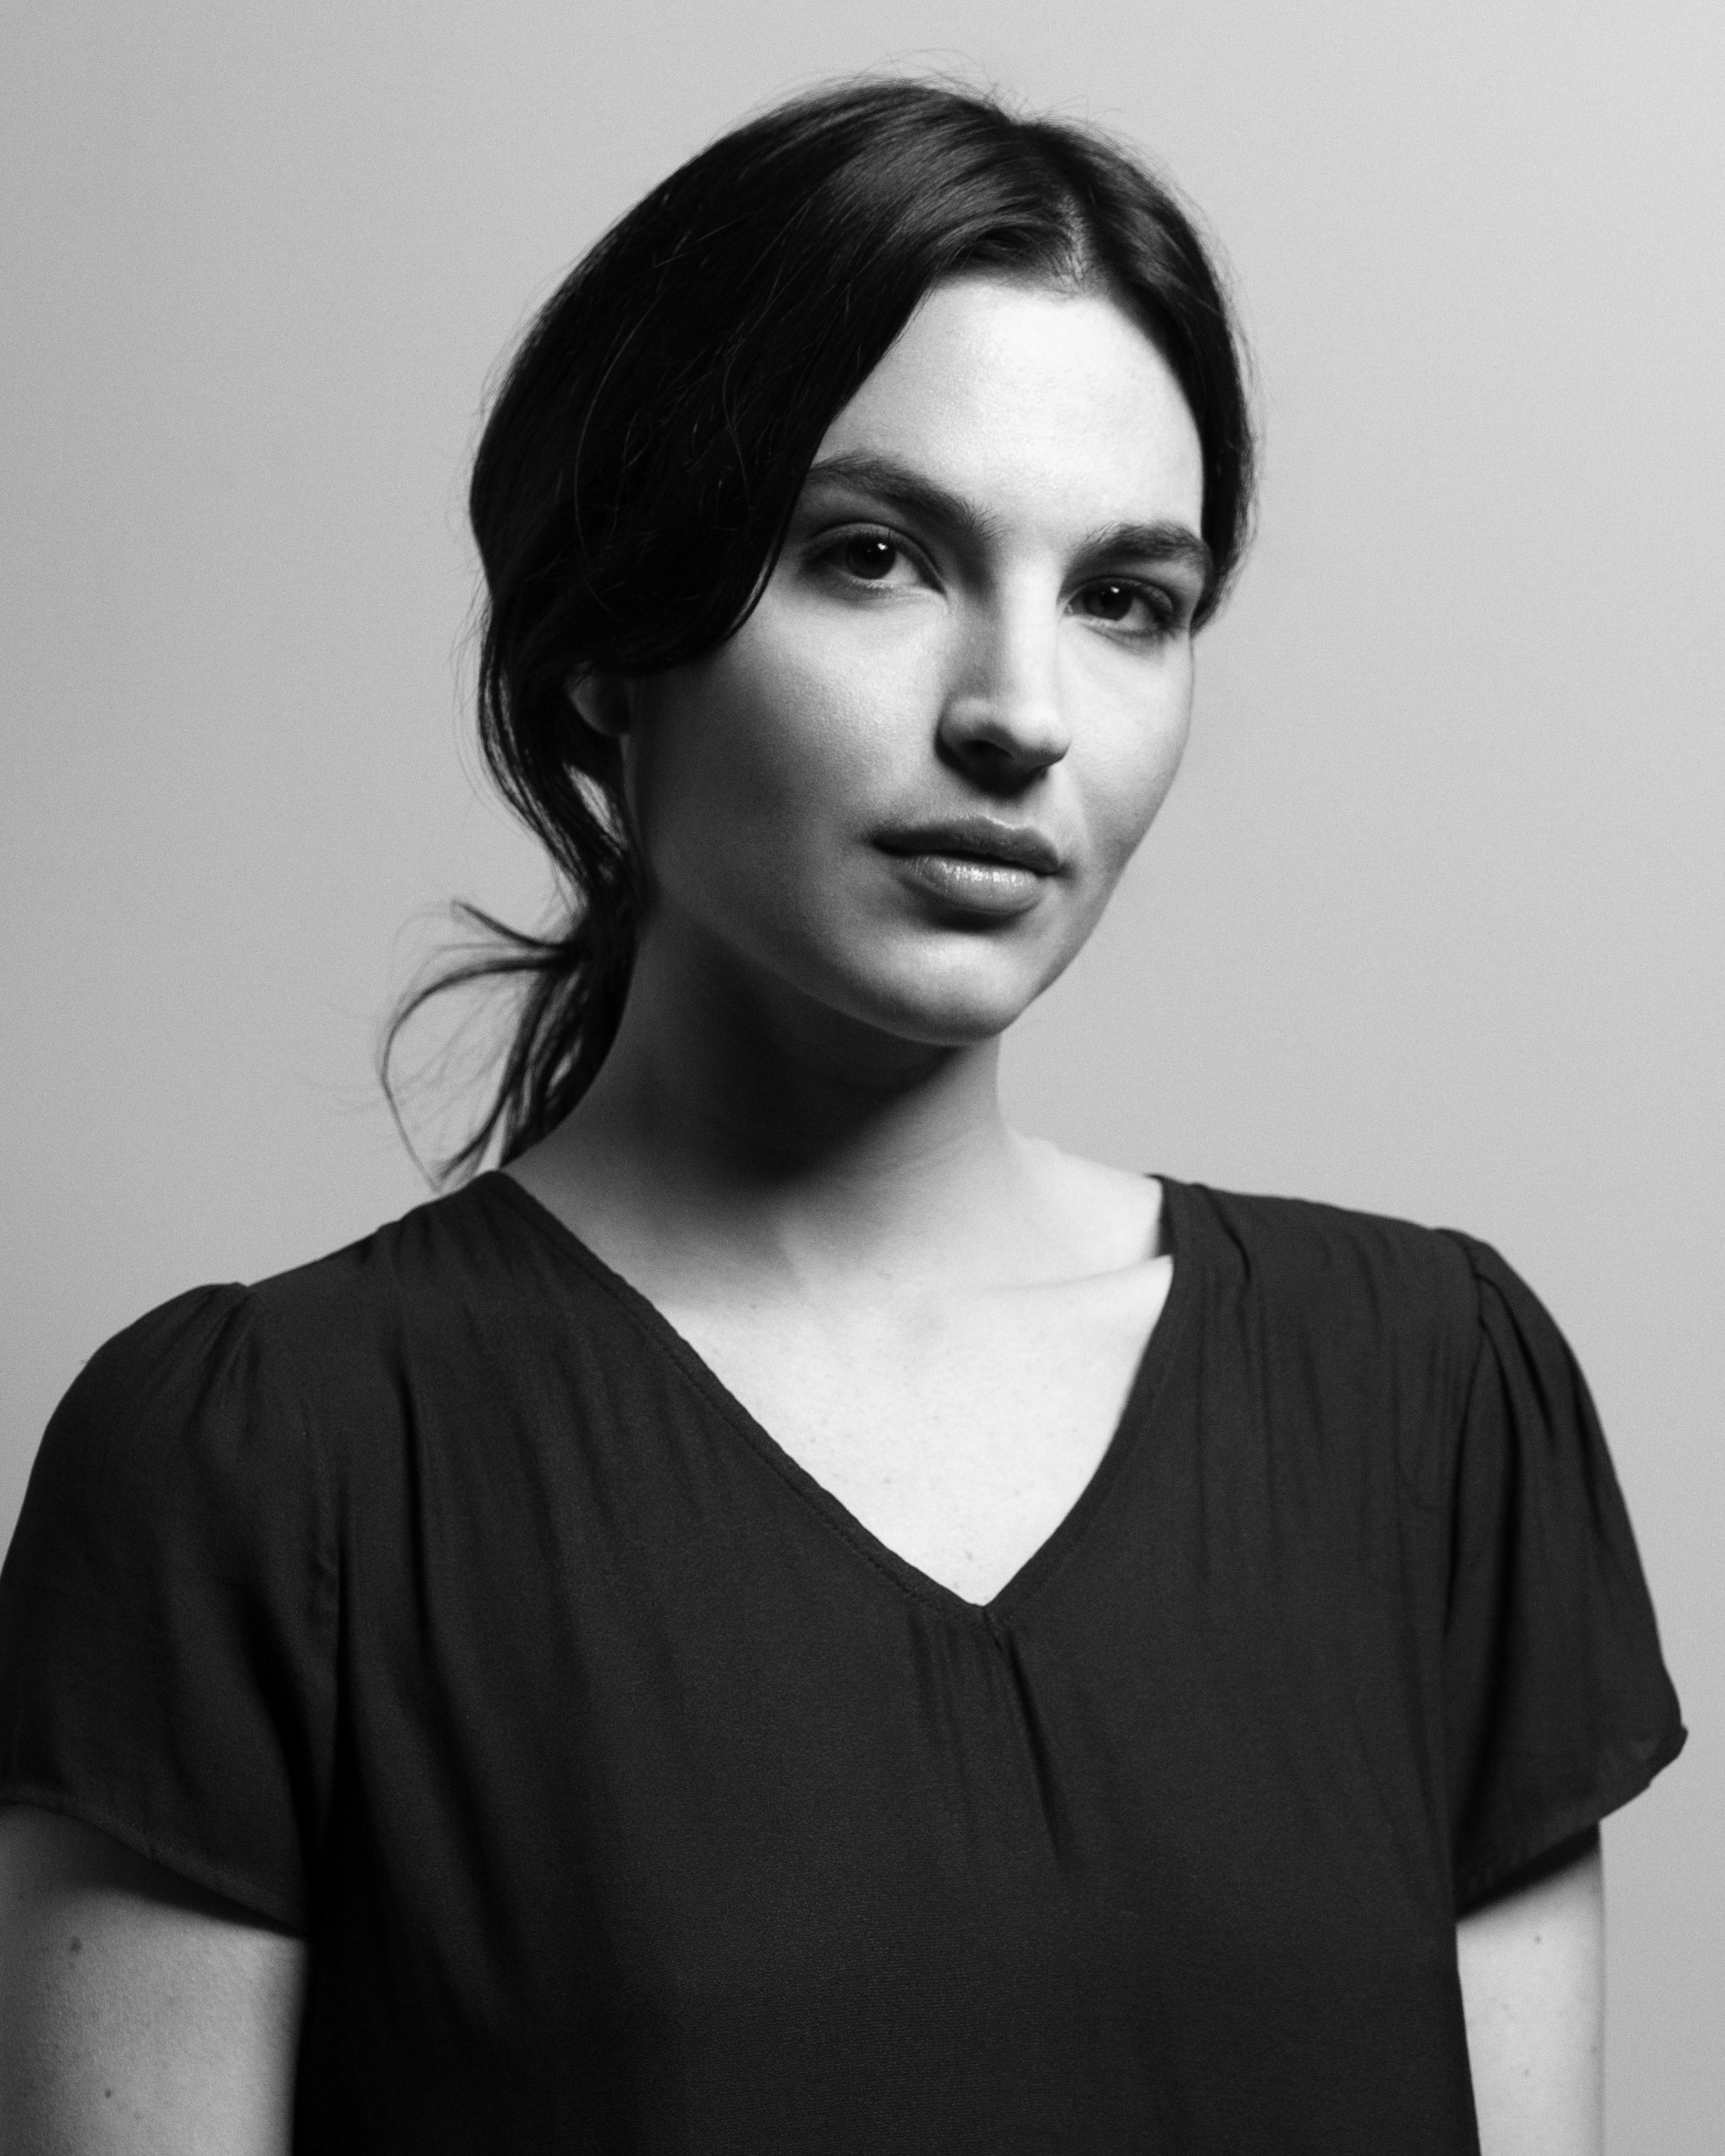 Nathalie Simille - black